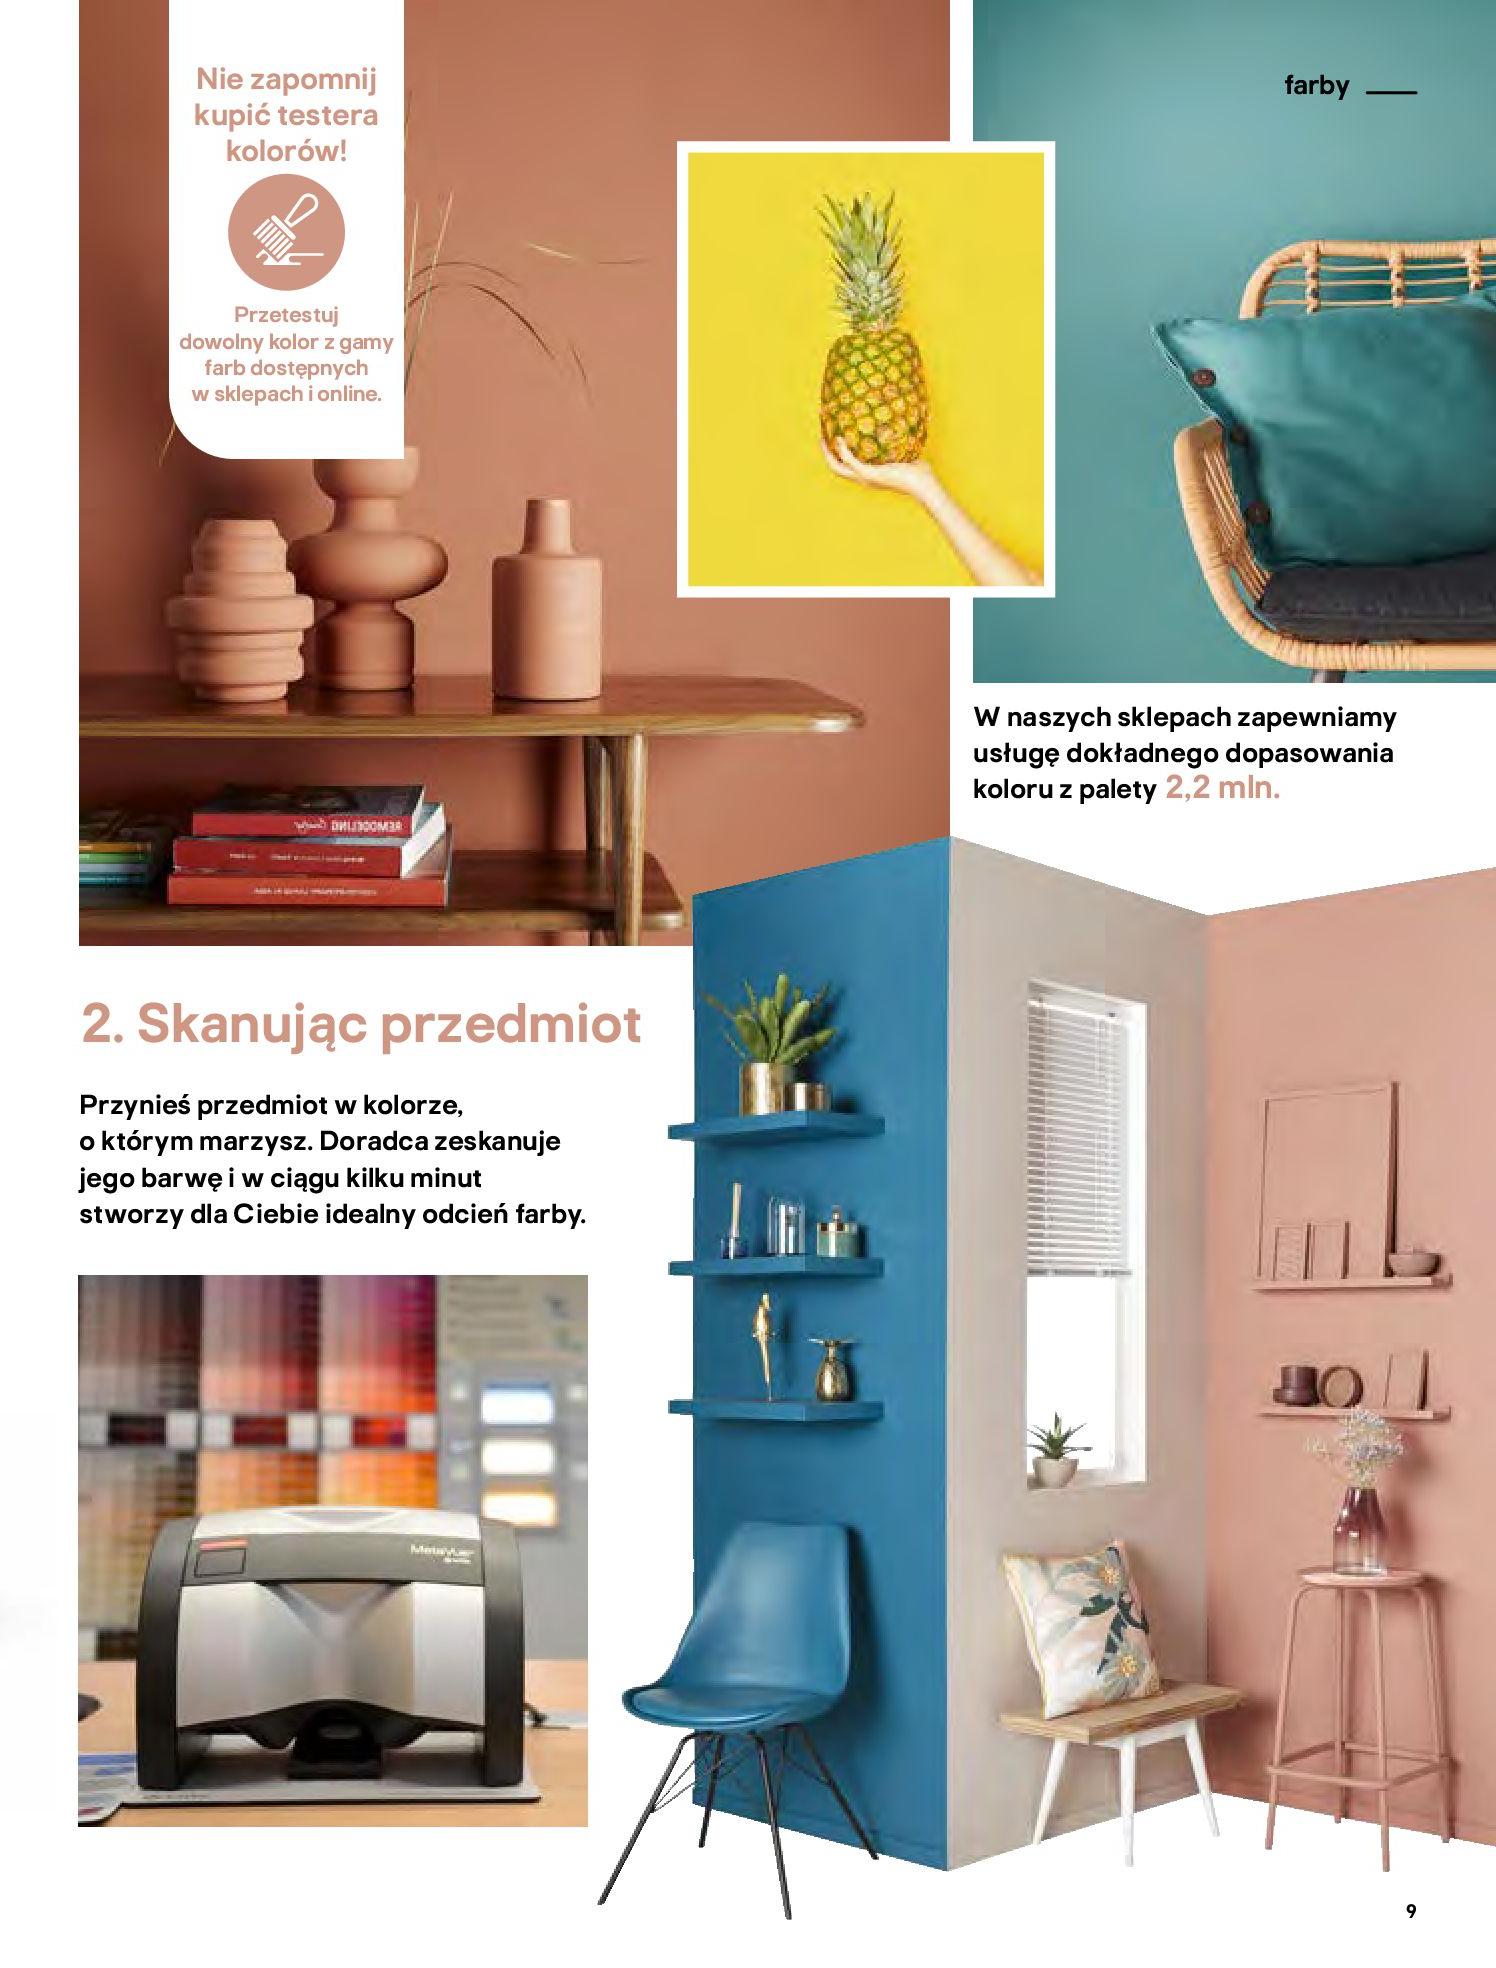 Gazetka Castorama - Katalog Dekoracje-22.10.2020-31.12.2020-page-9